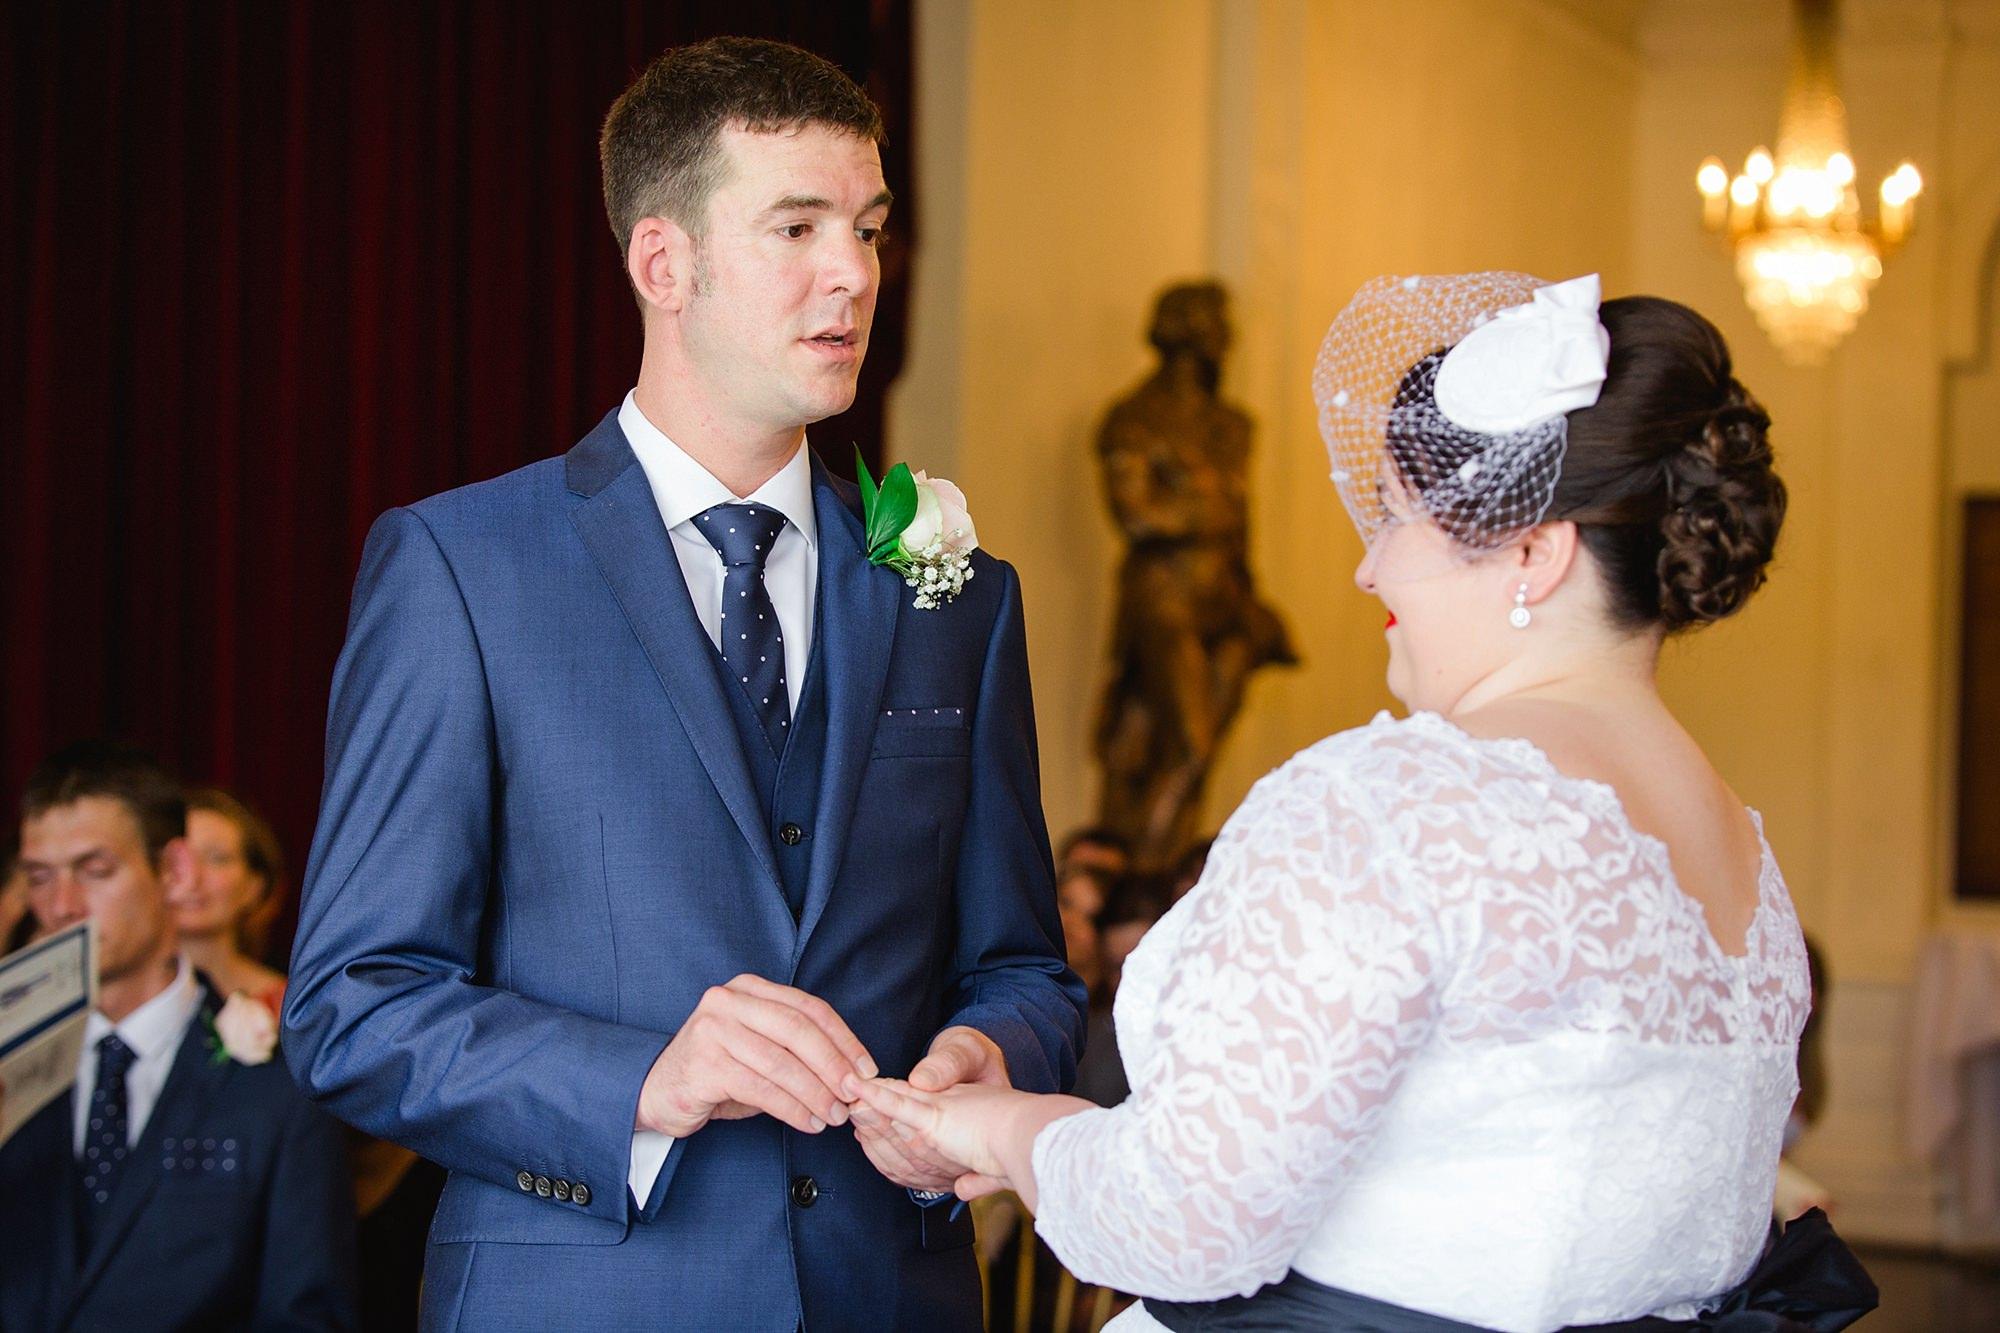 Trafalgar Tavern wedding from gives ring to bride